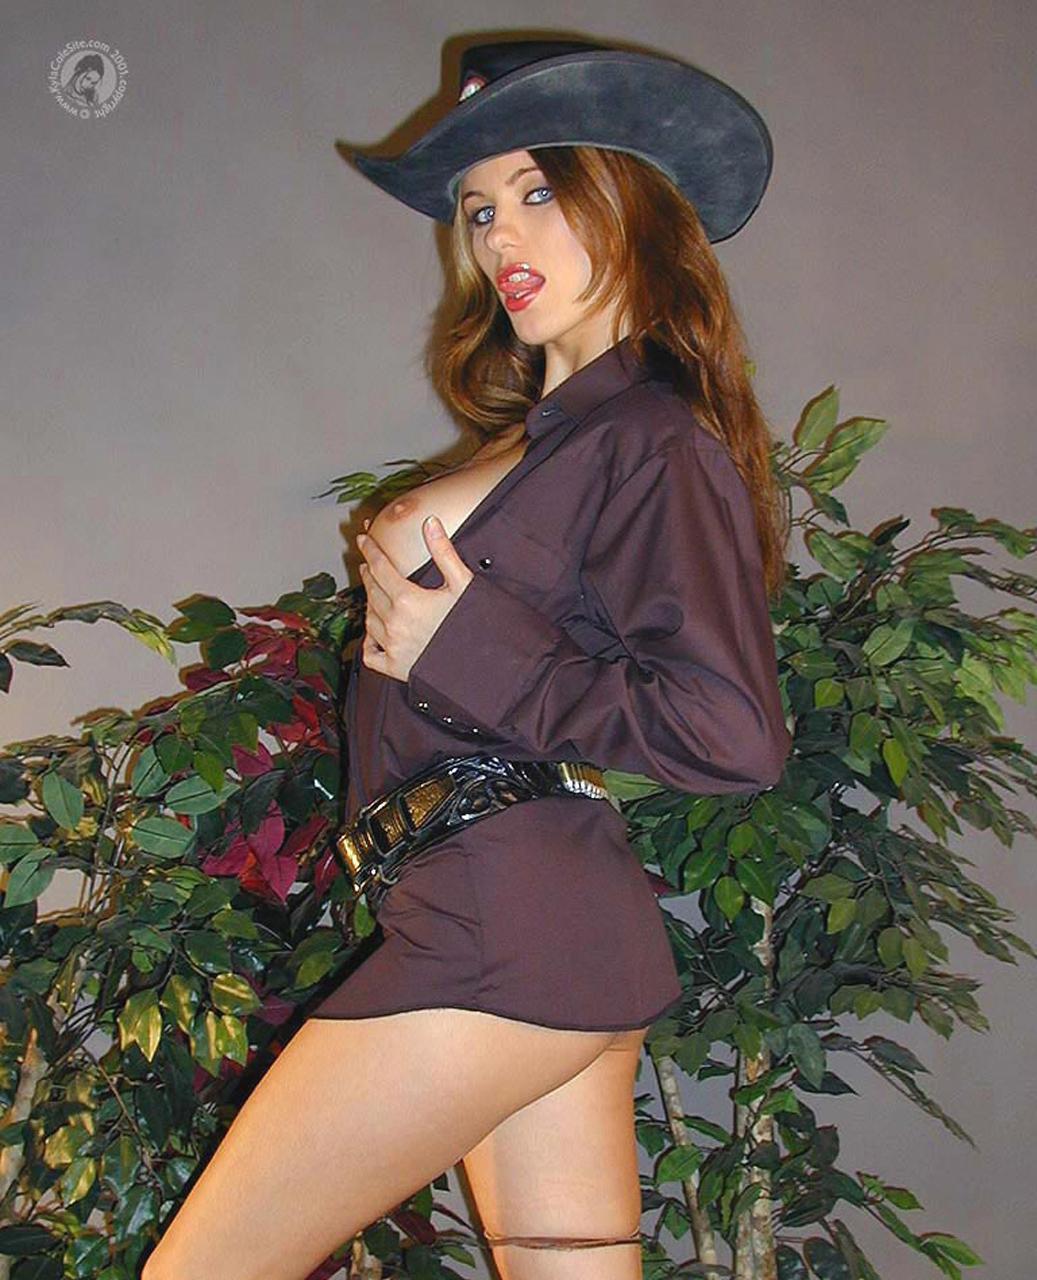 kyla-cole-cowgirl-4